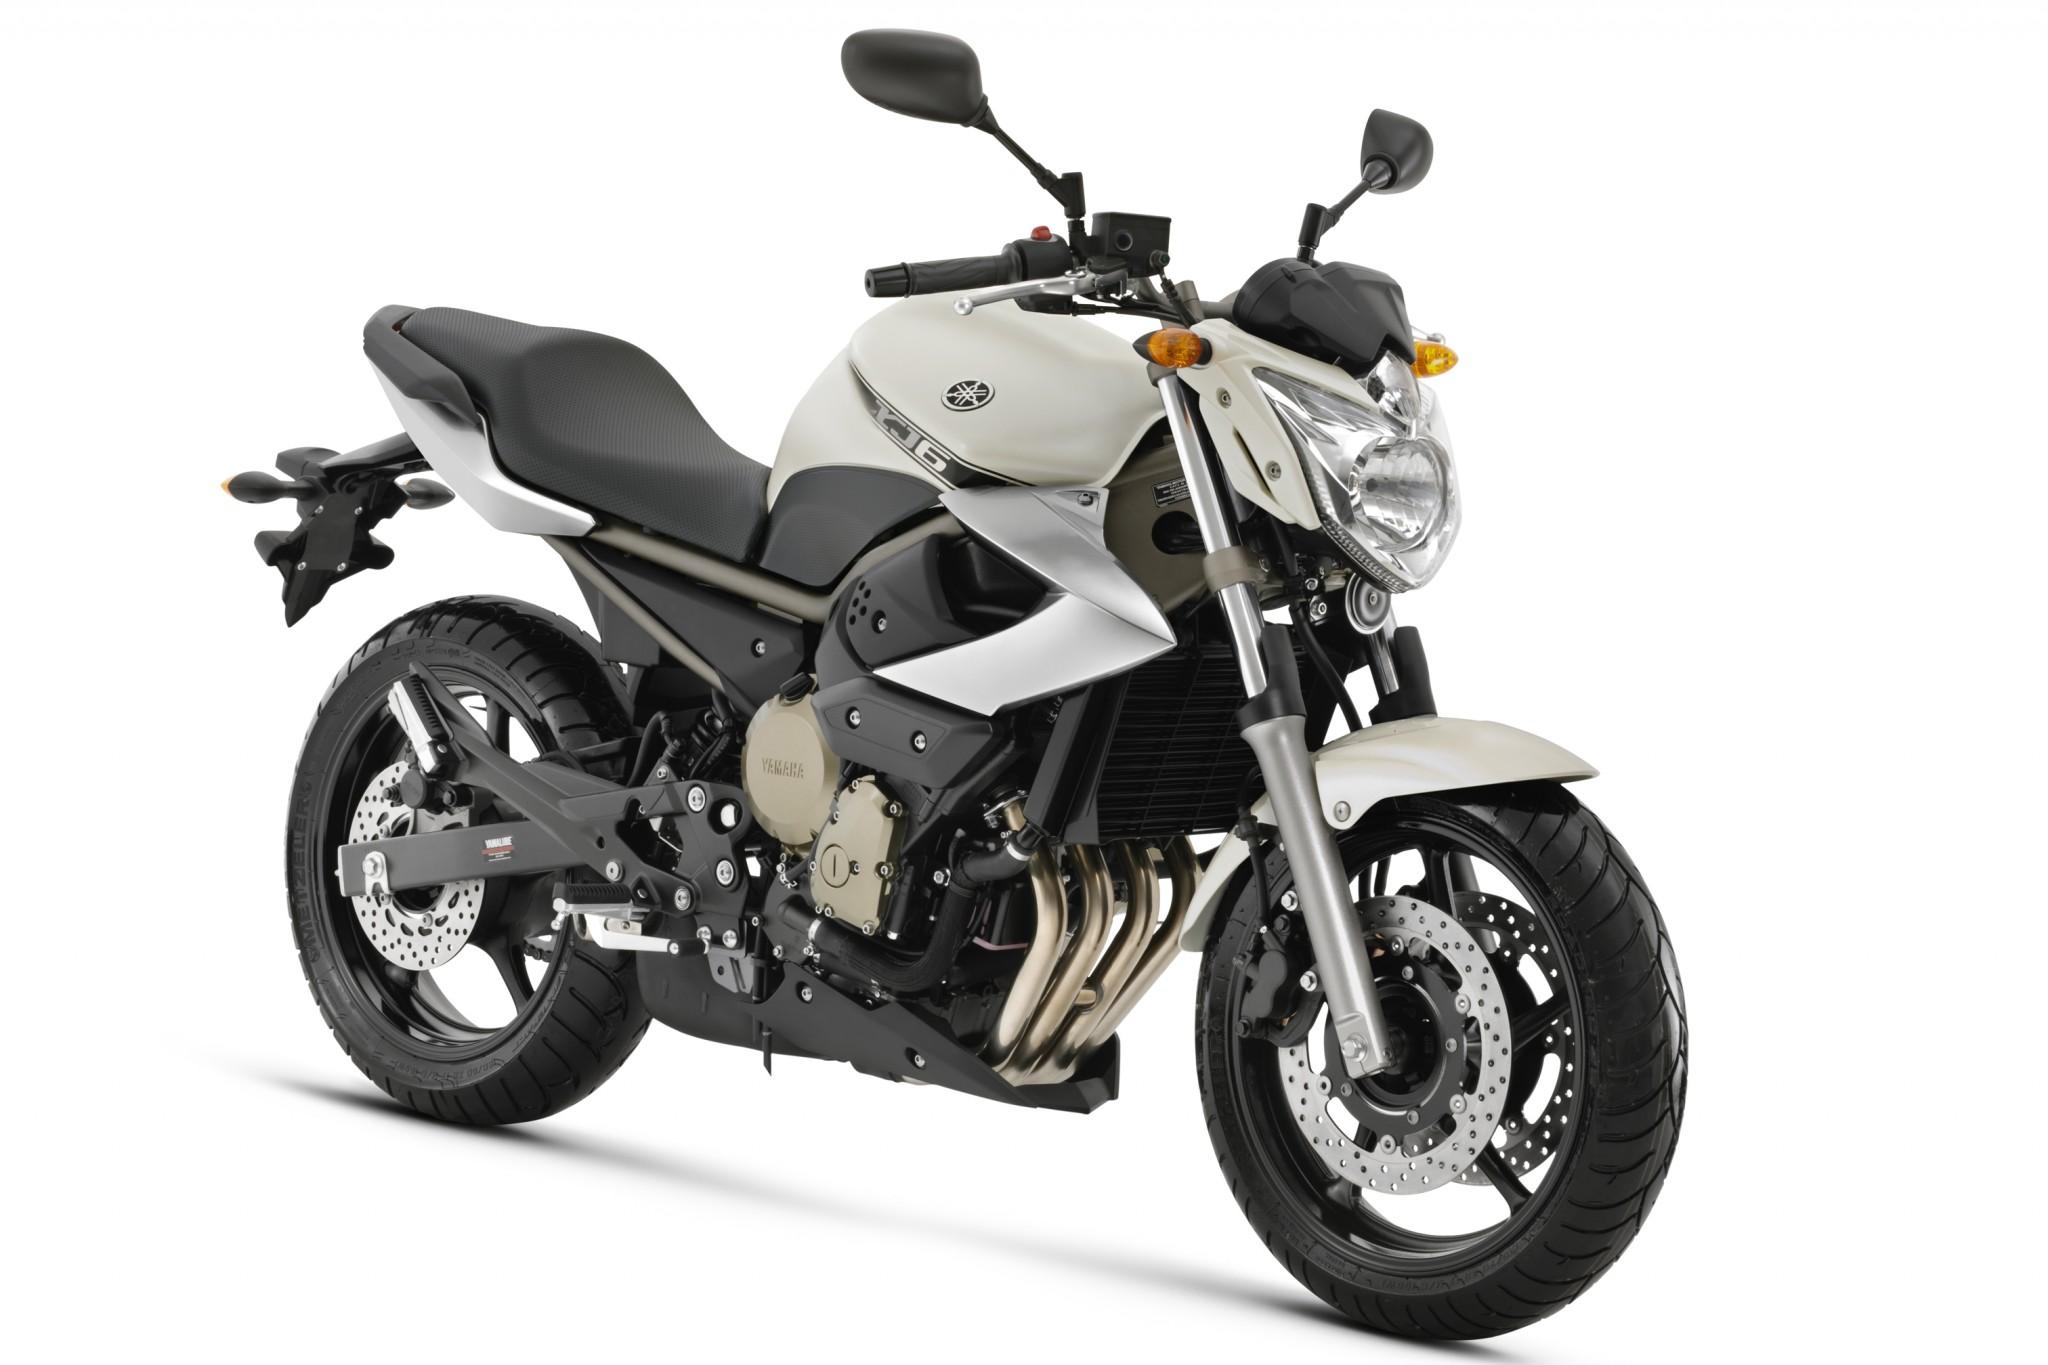 Célèbre Yamaha lança a XJ6 Diversion no Brasil | Motos Blog DK89